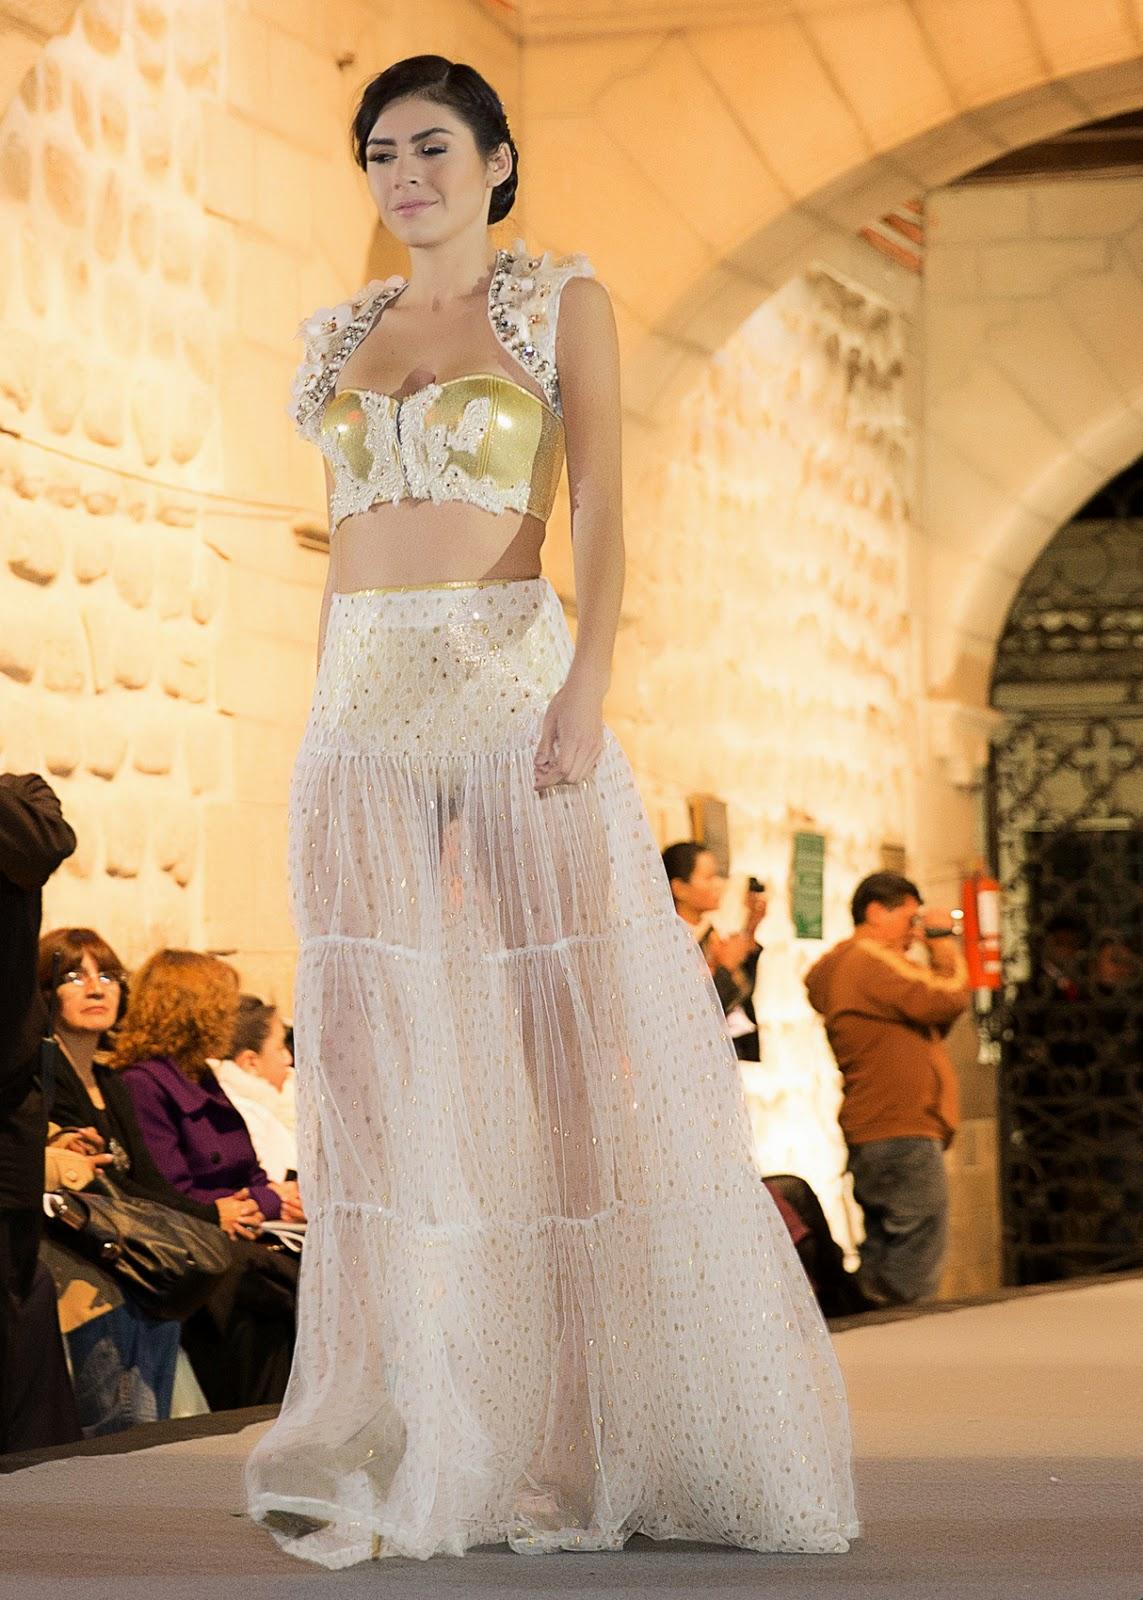 Bridal Trends: Top 10 Wedding Dresses for 2015